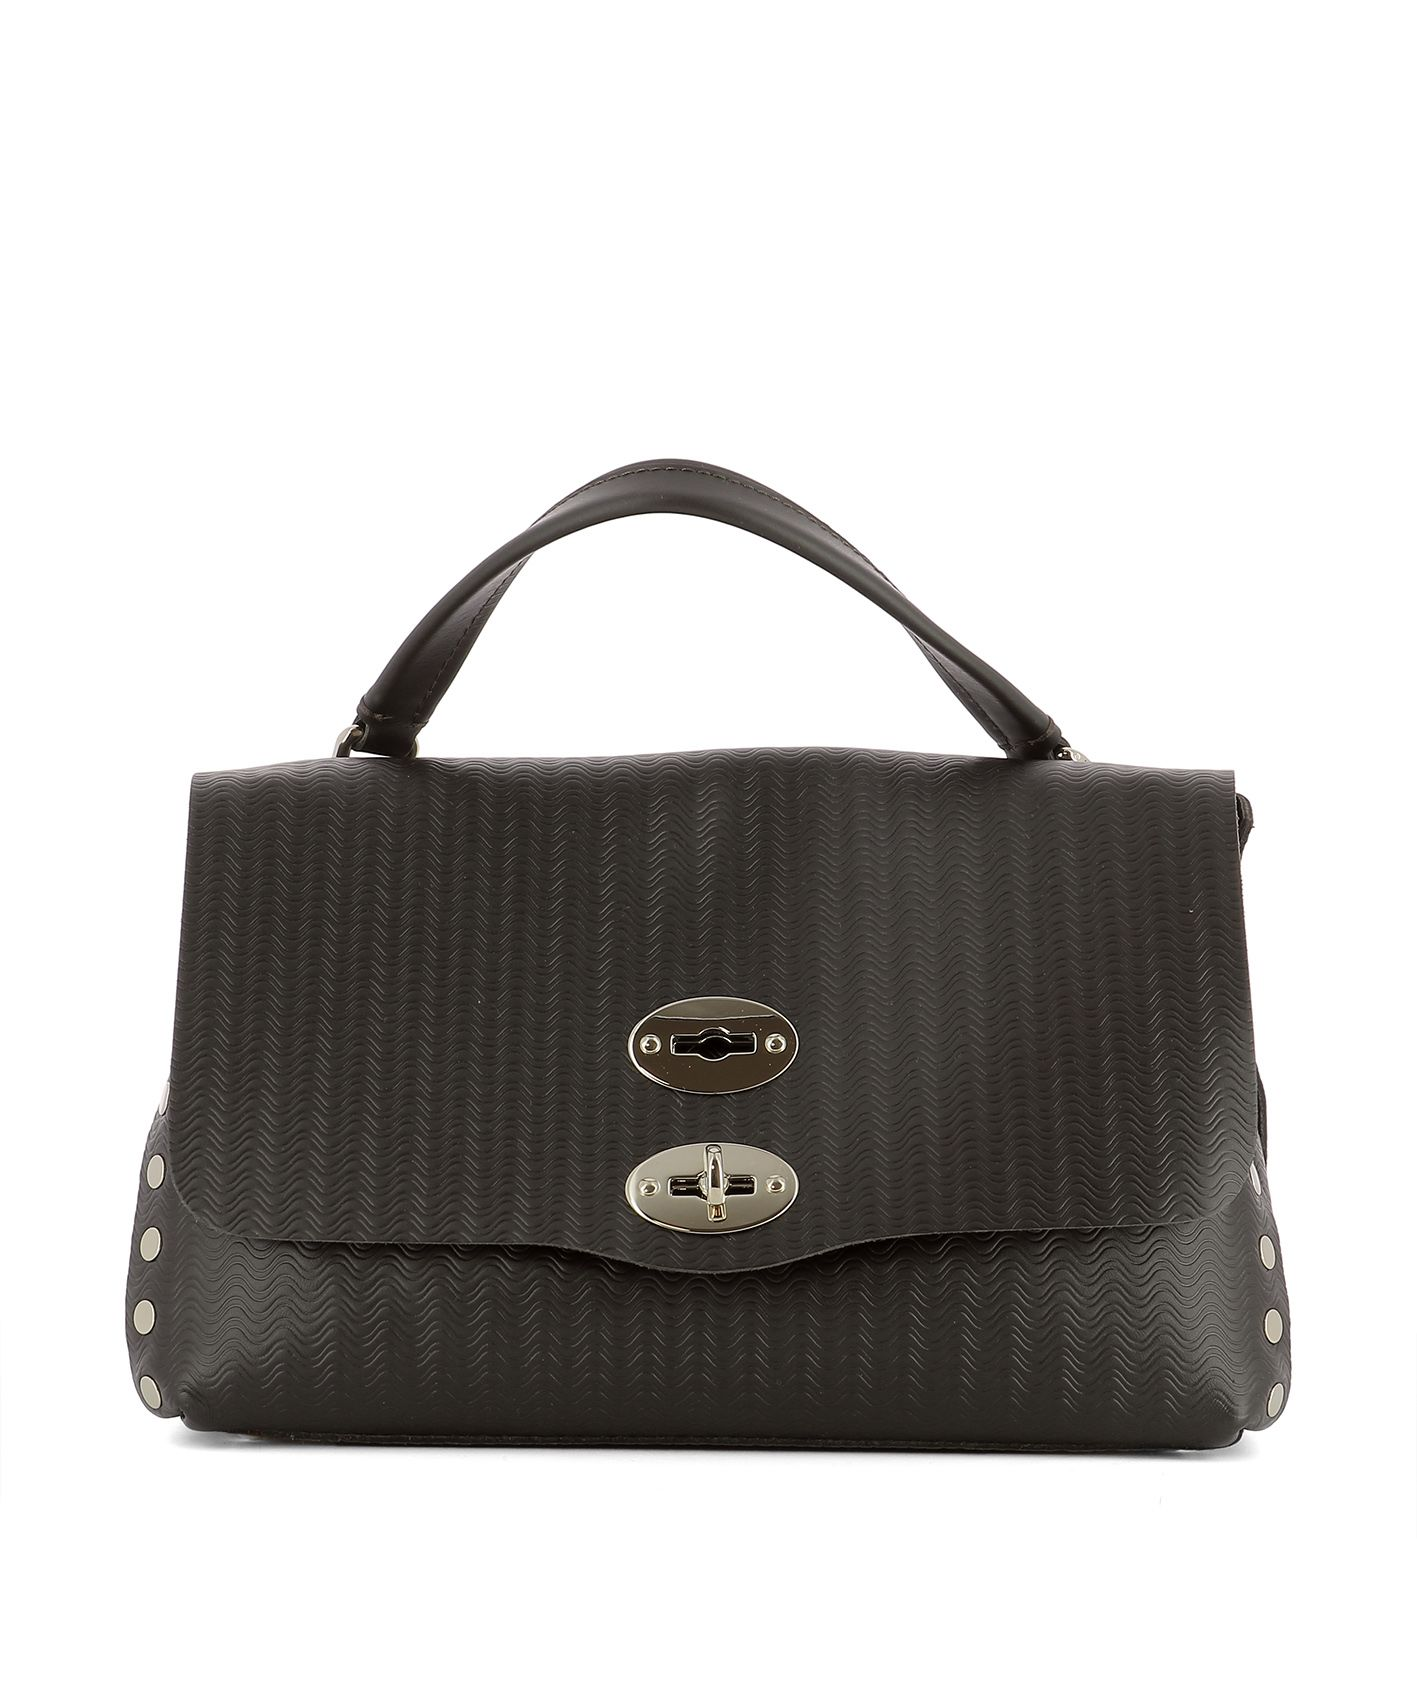 Brown Leather Handle Bag